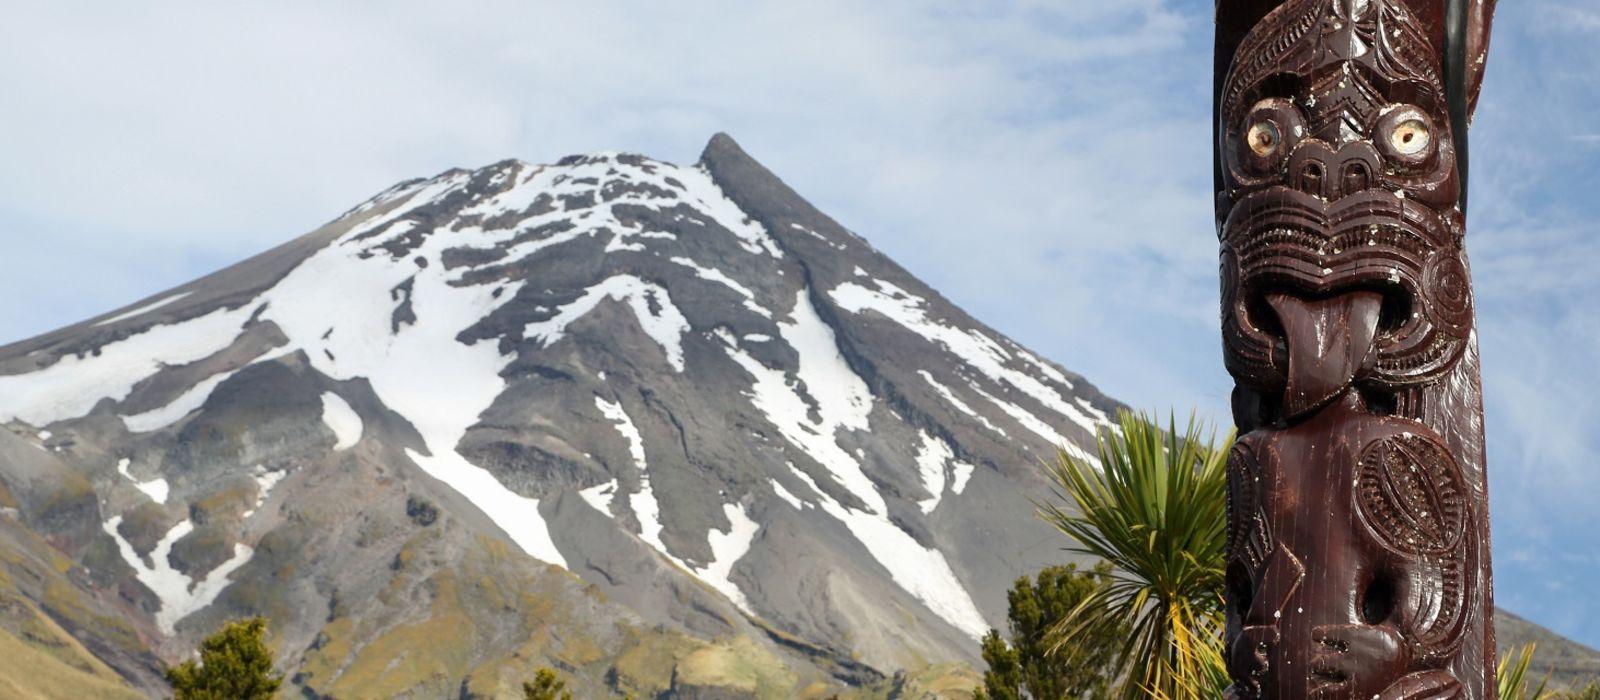 History of New Zealand - Maori statue